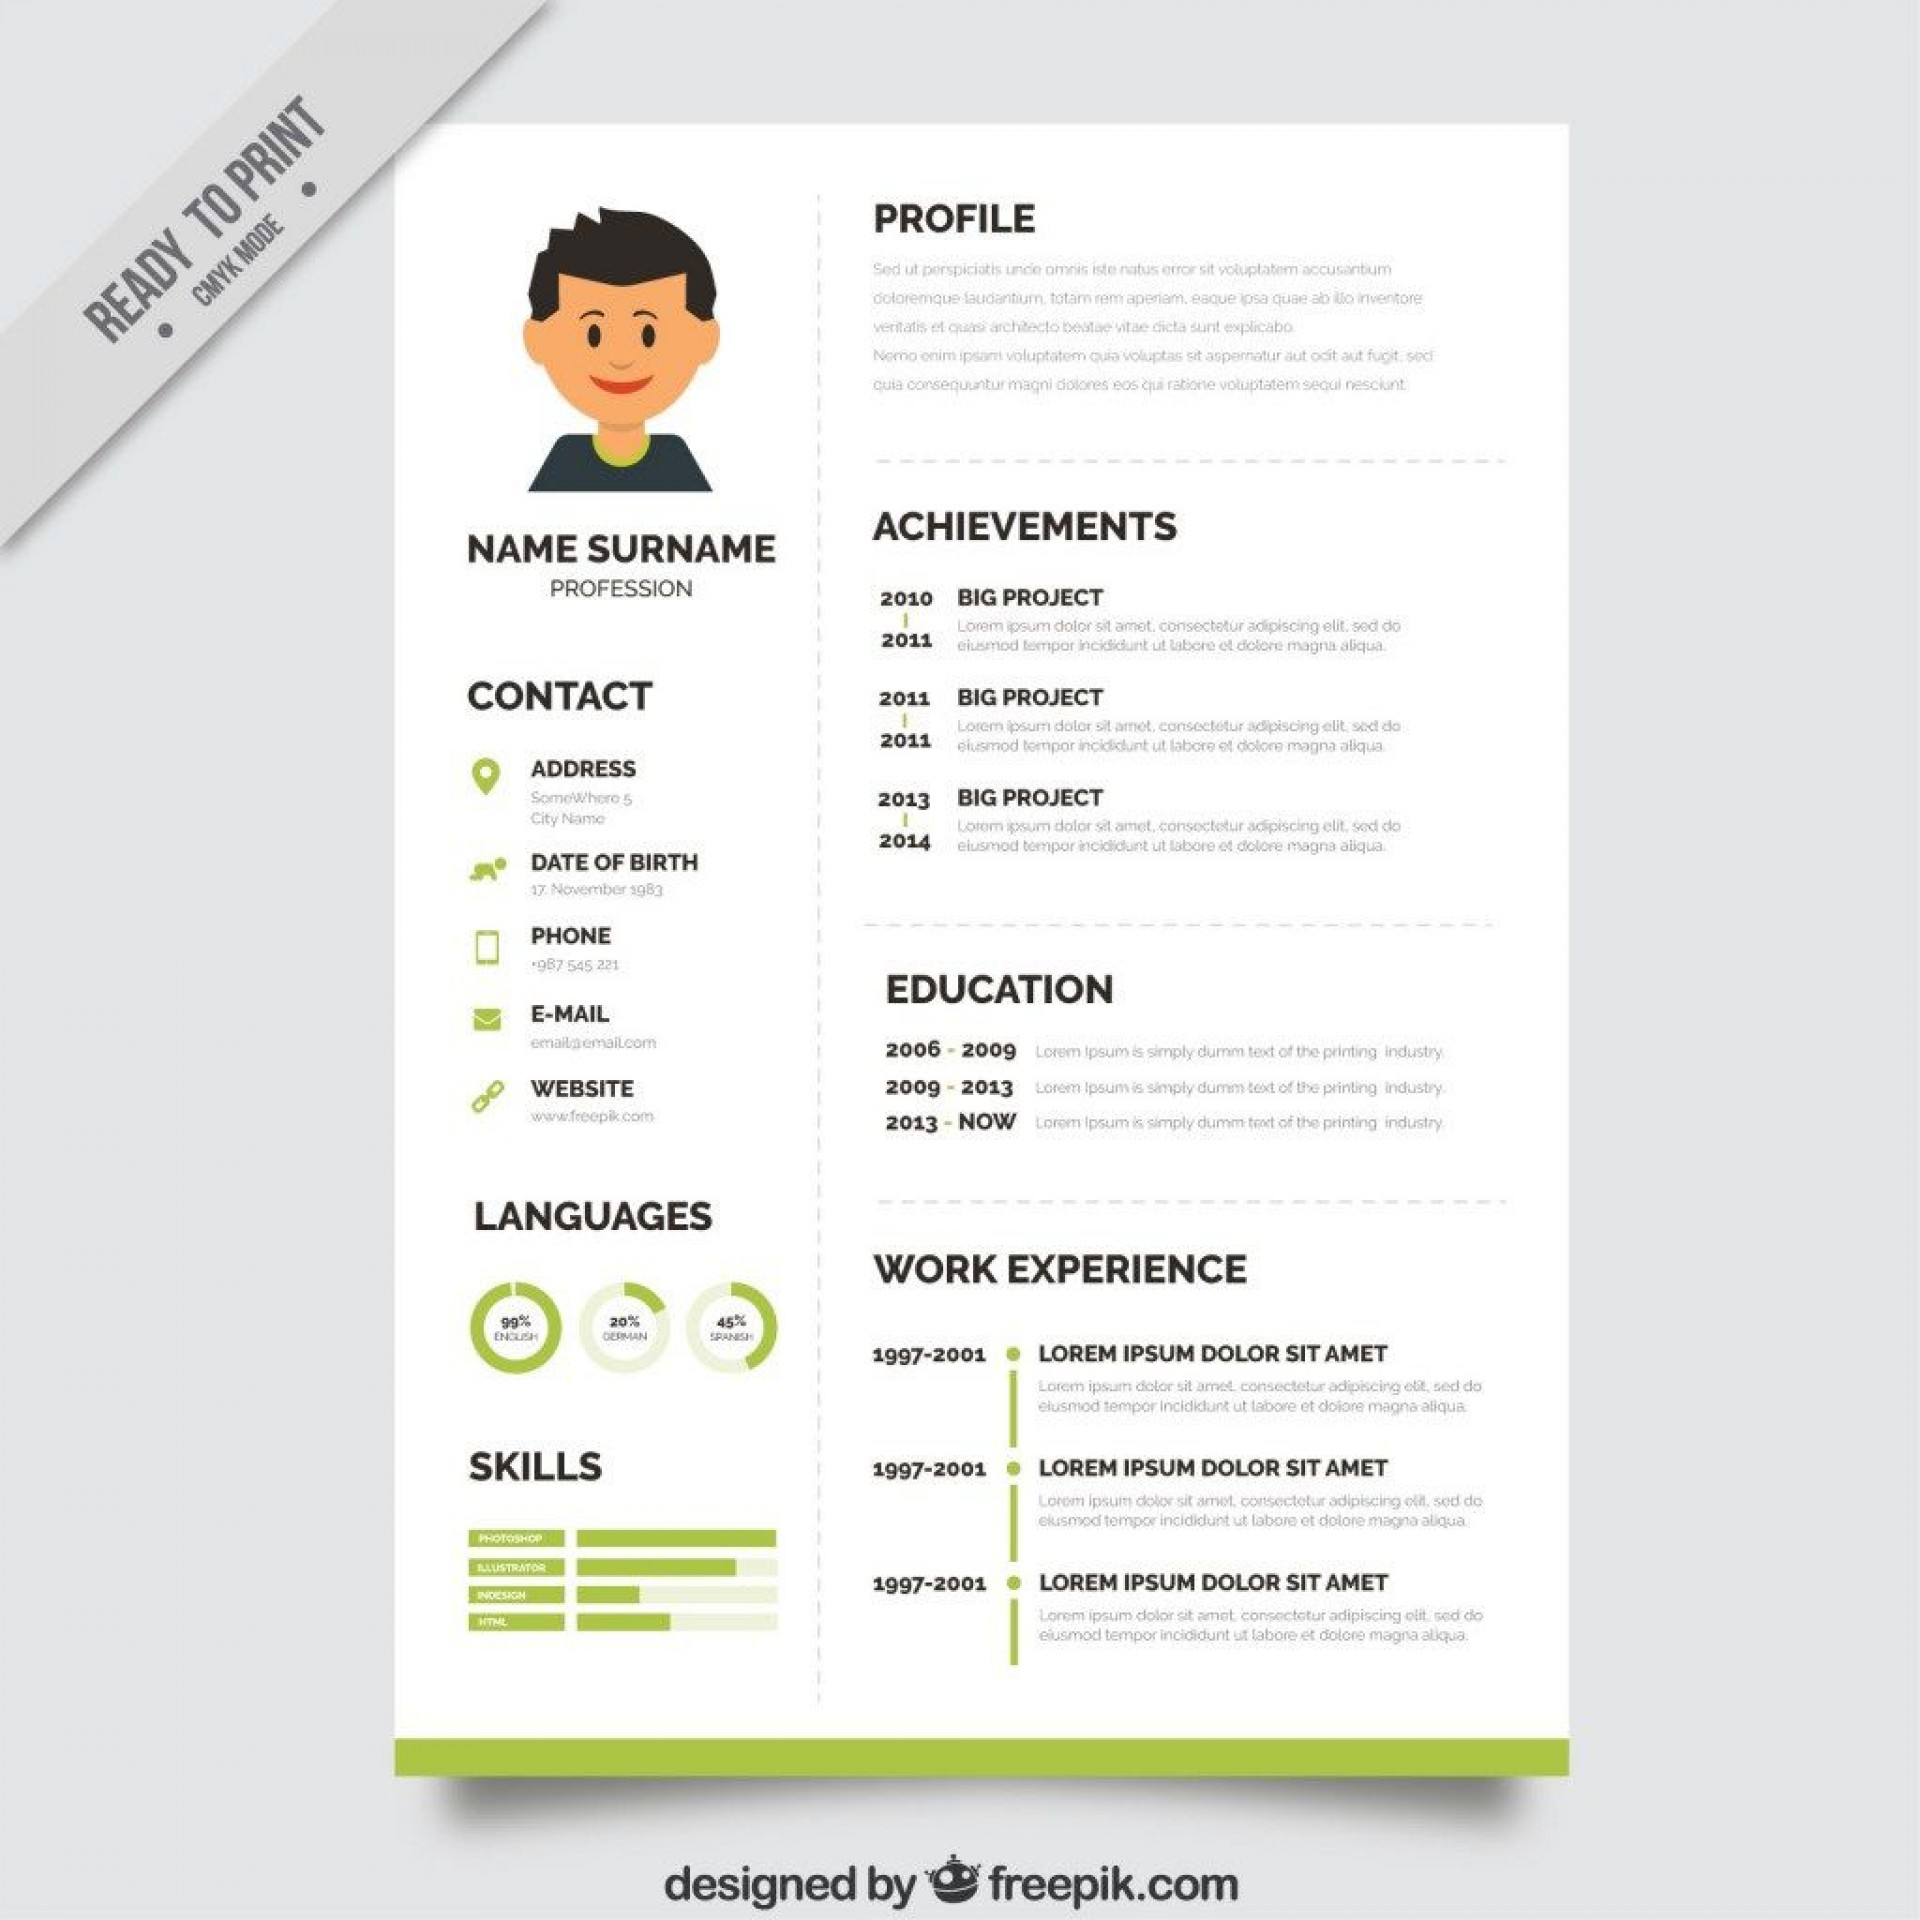 007 Shocking Free Basic Resume Template Download Image  M Word Quora For Microsoft 20101920